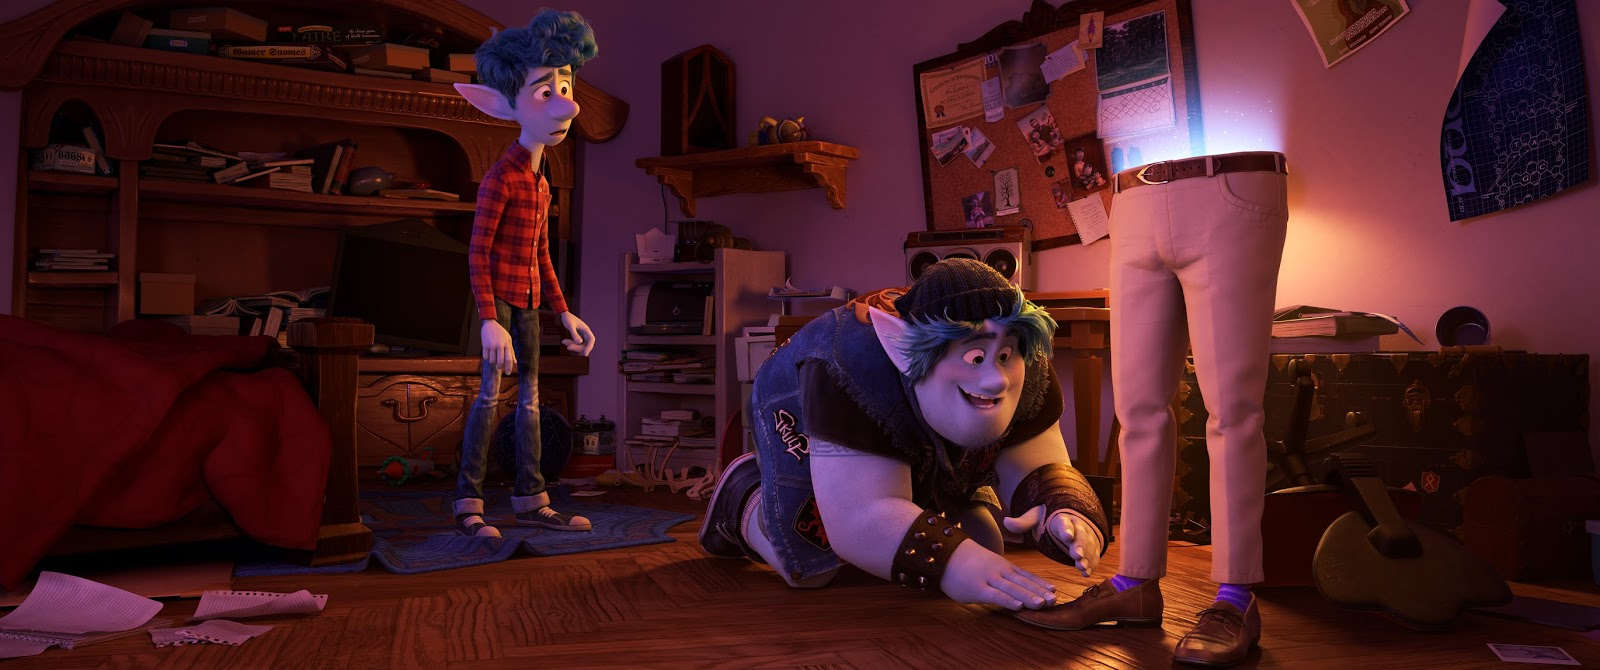 Pixar-Onward-Ian-and-Barley-Lightfoot-and-Dad.jpg